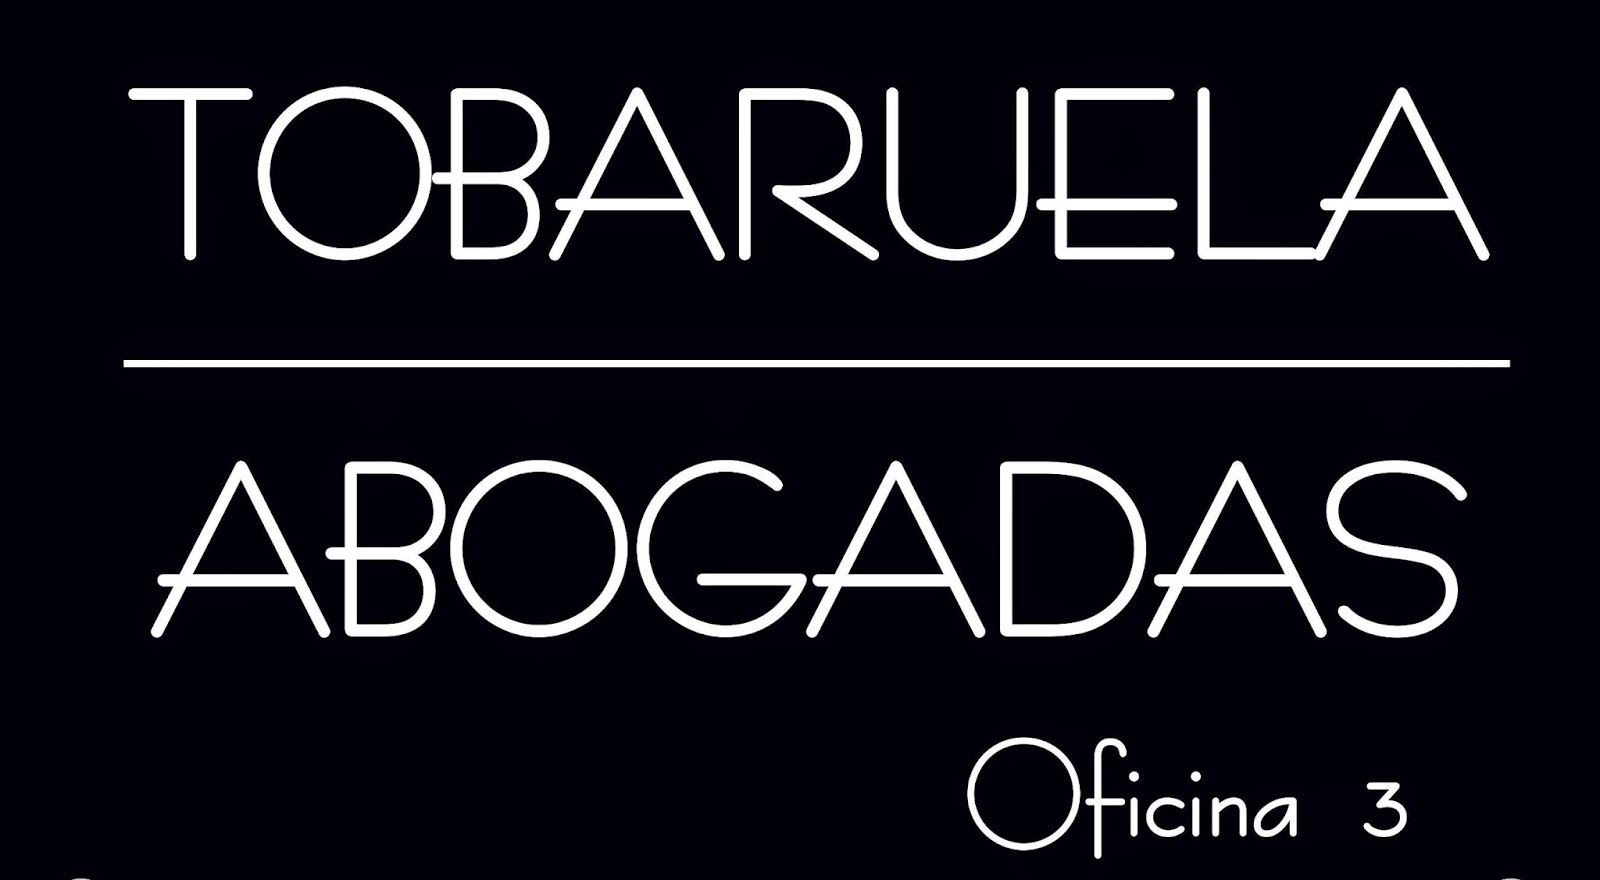 http://europaschoollinks.blogspot.com/2014/09/tobaruela-abogadas.html